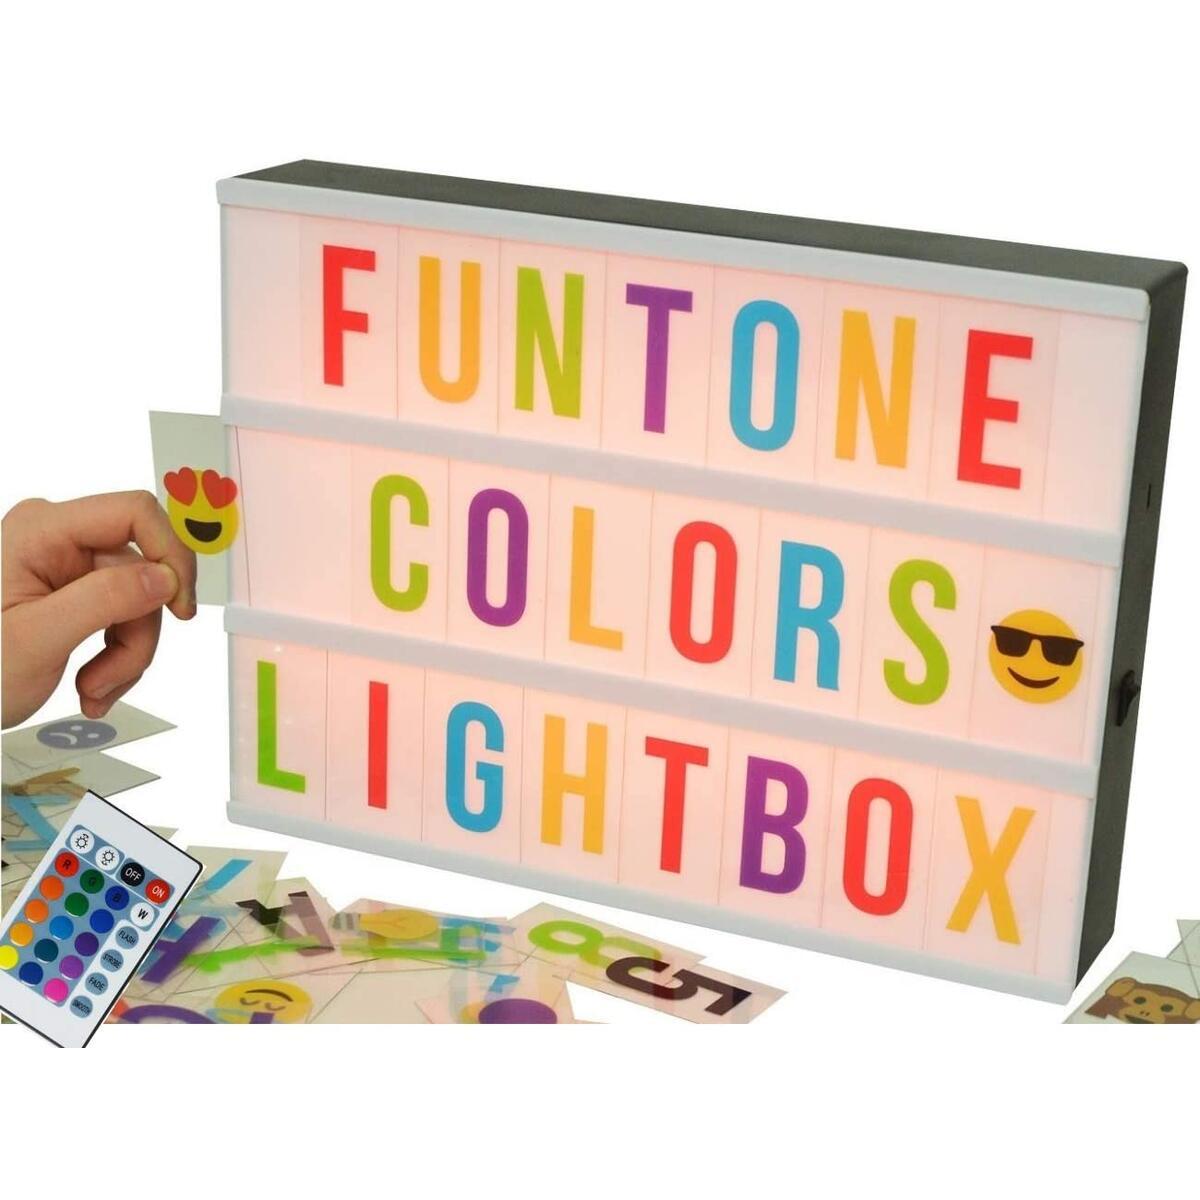 Cinema light box